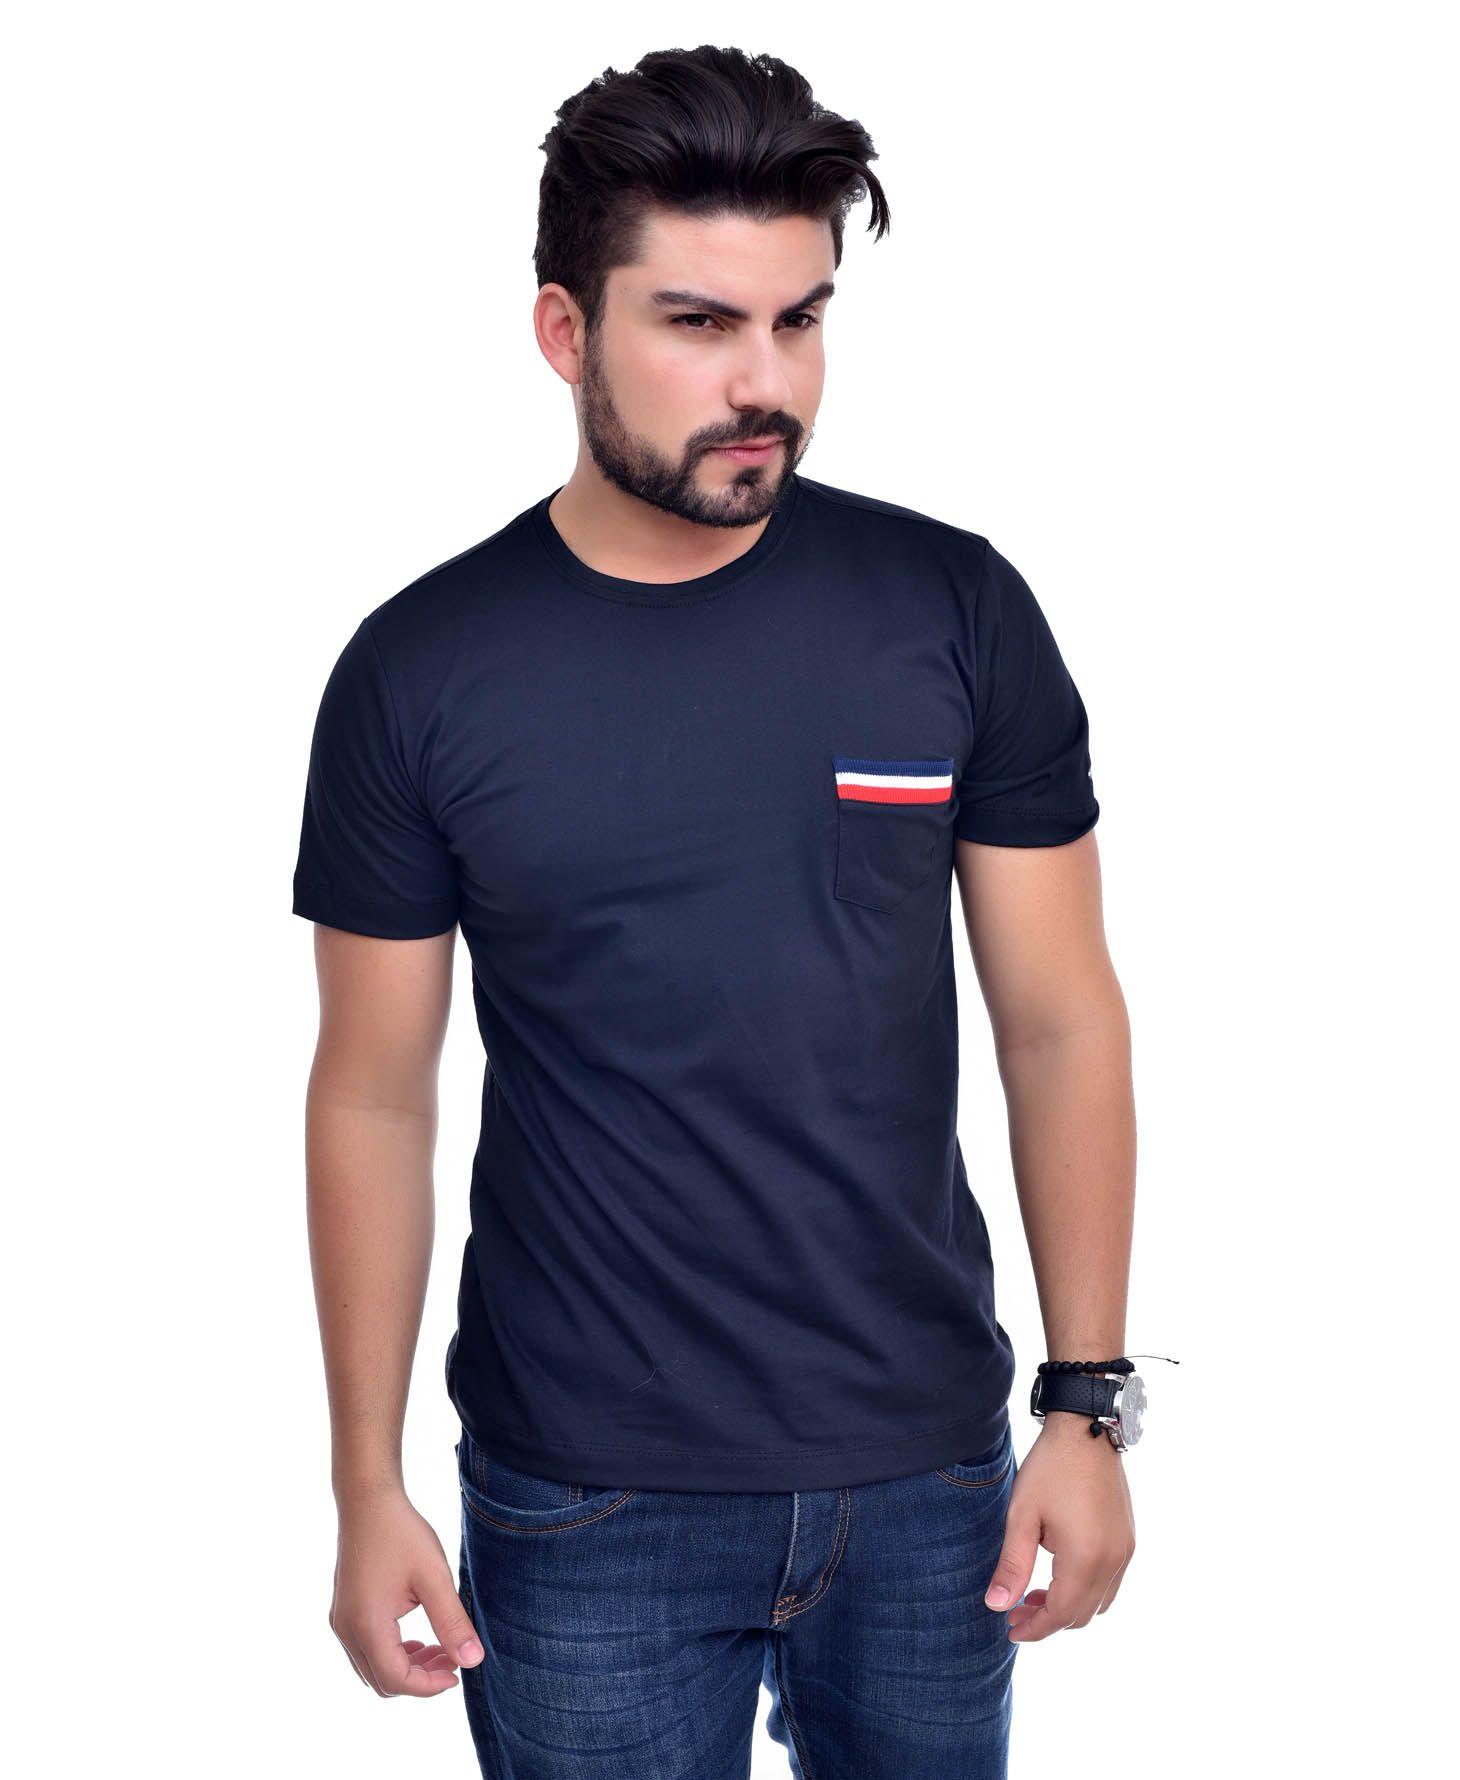 Camiseta Bolso Th Preta / Pta